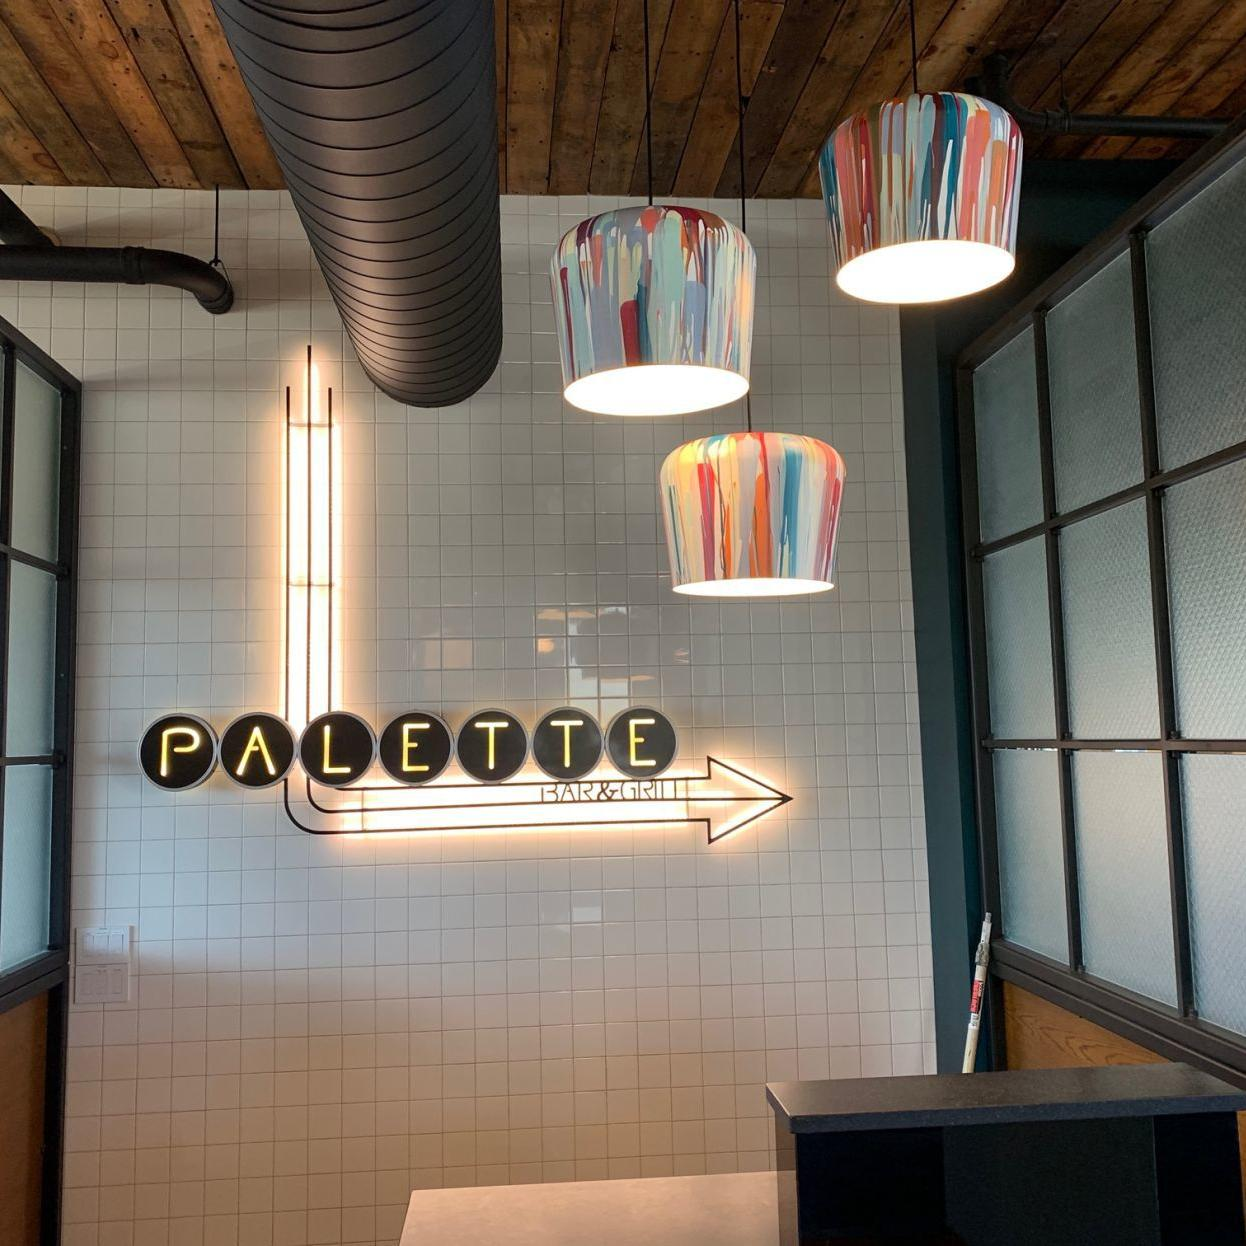 Palette Bar And Grill Opens On East Washington Avenue Restaurants Madison Com